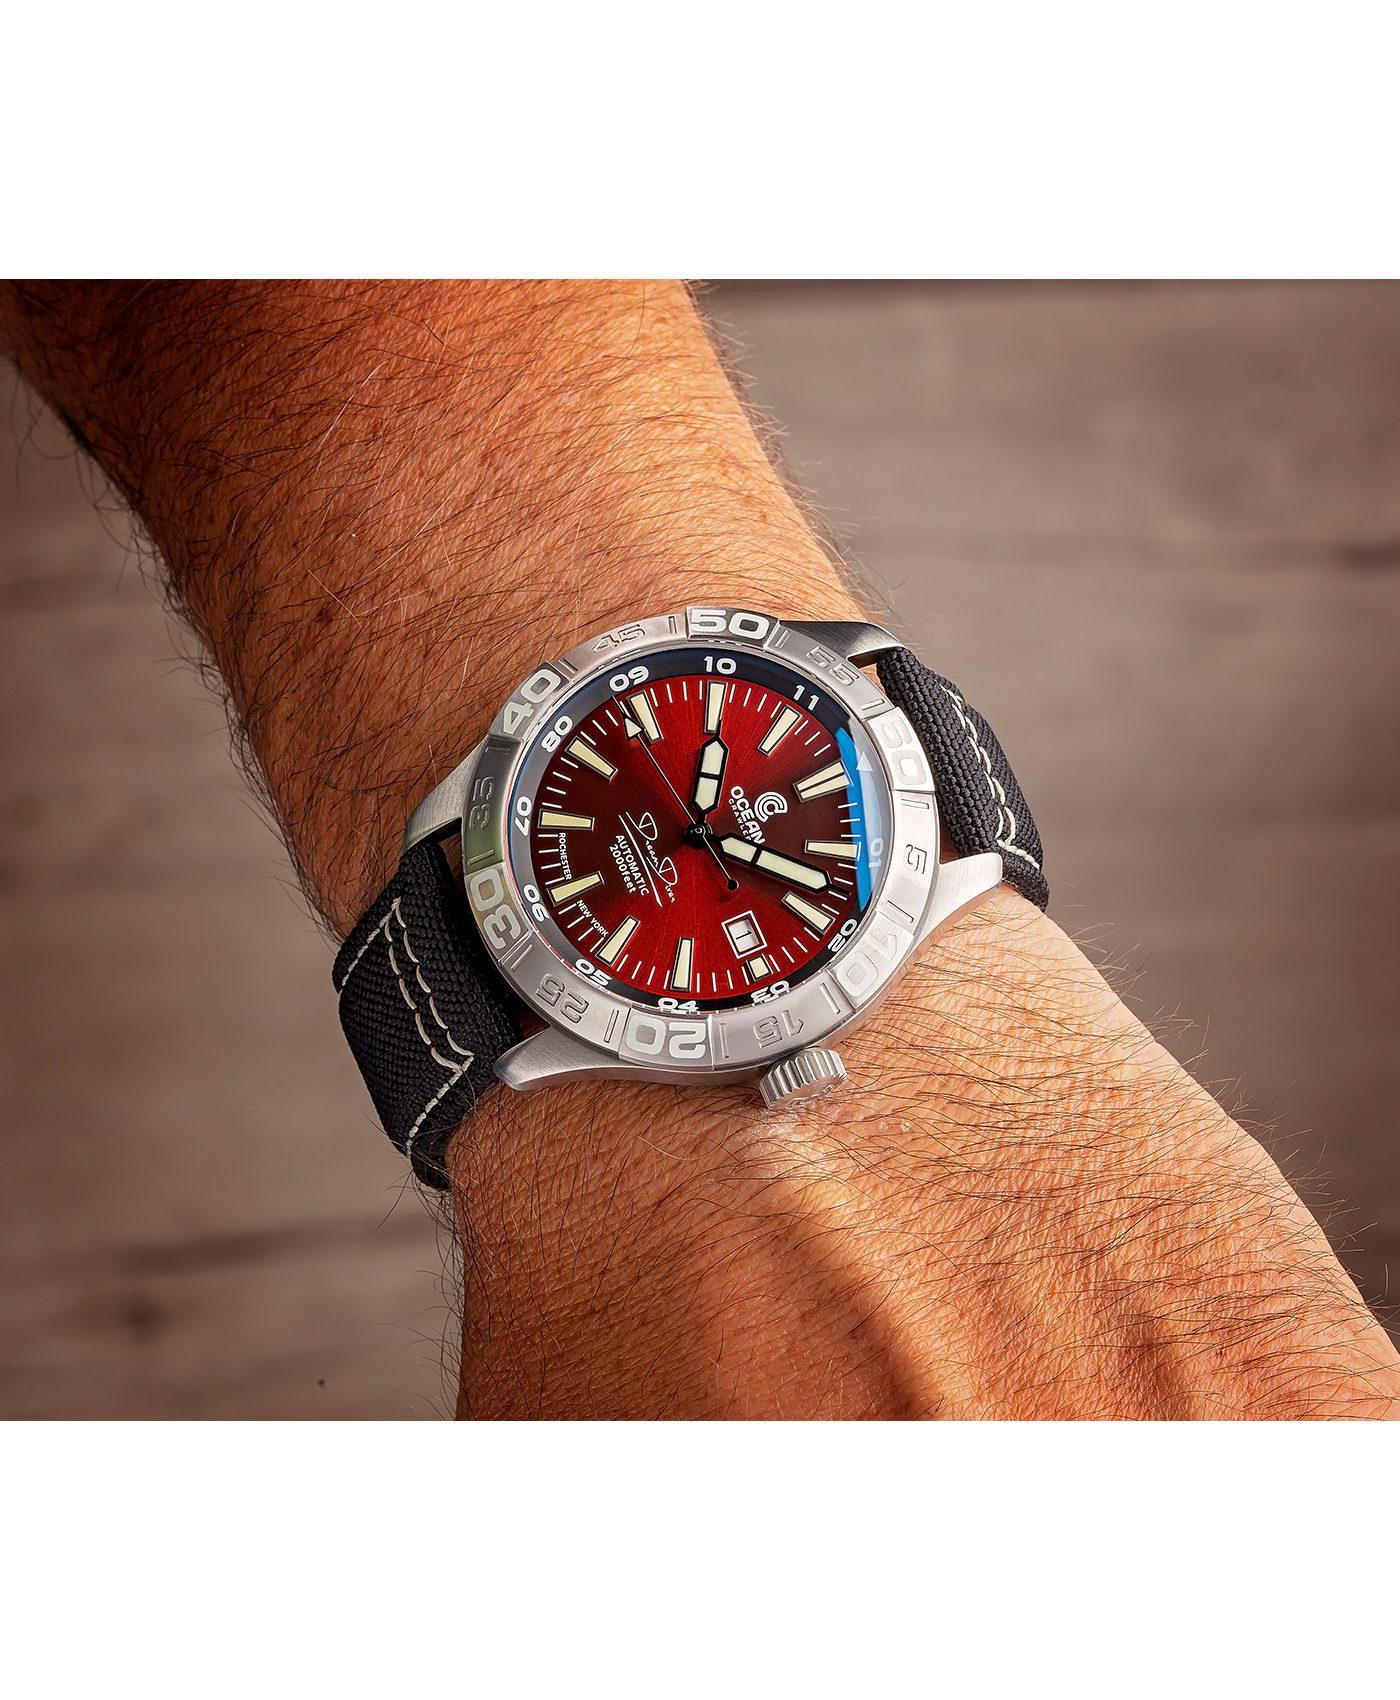 WB Ocean Crawler Dream Diver Dream Diver Red Dial wrist